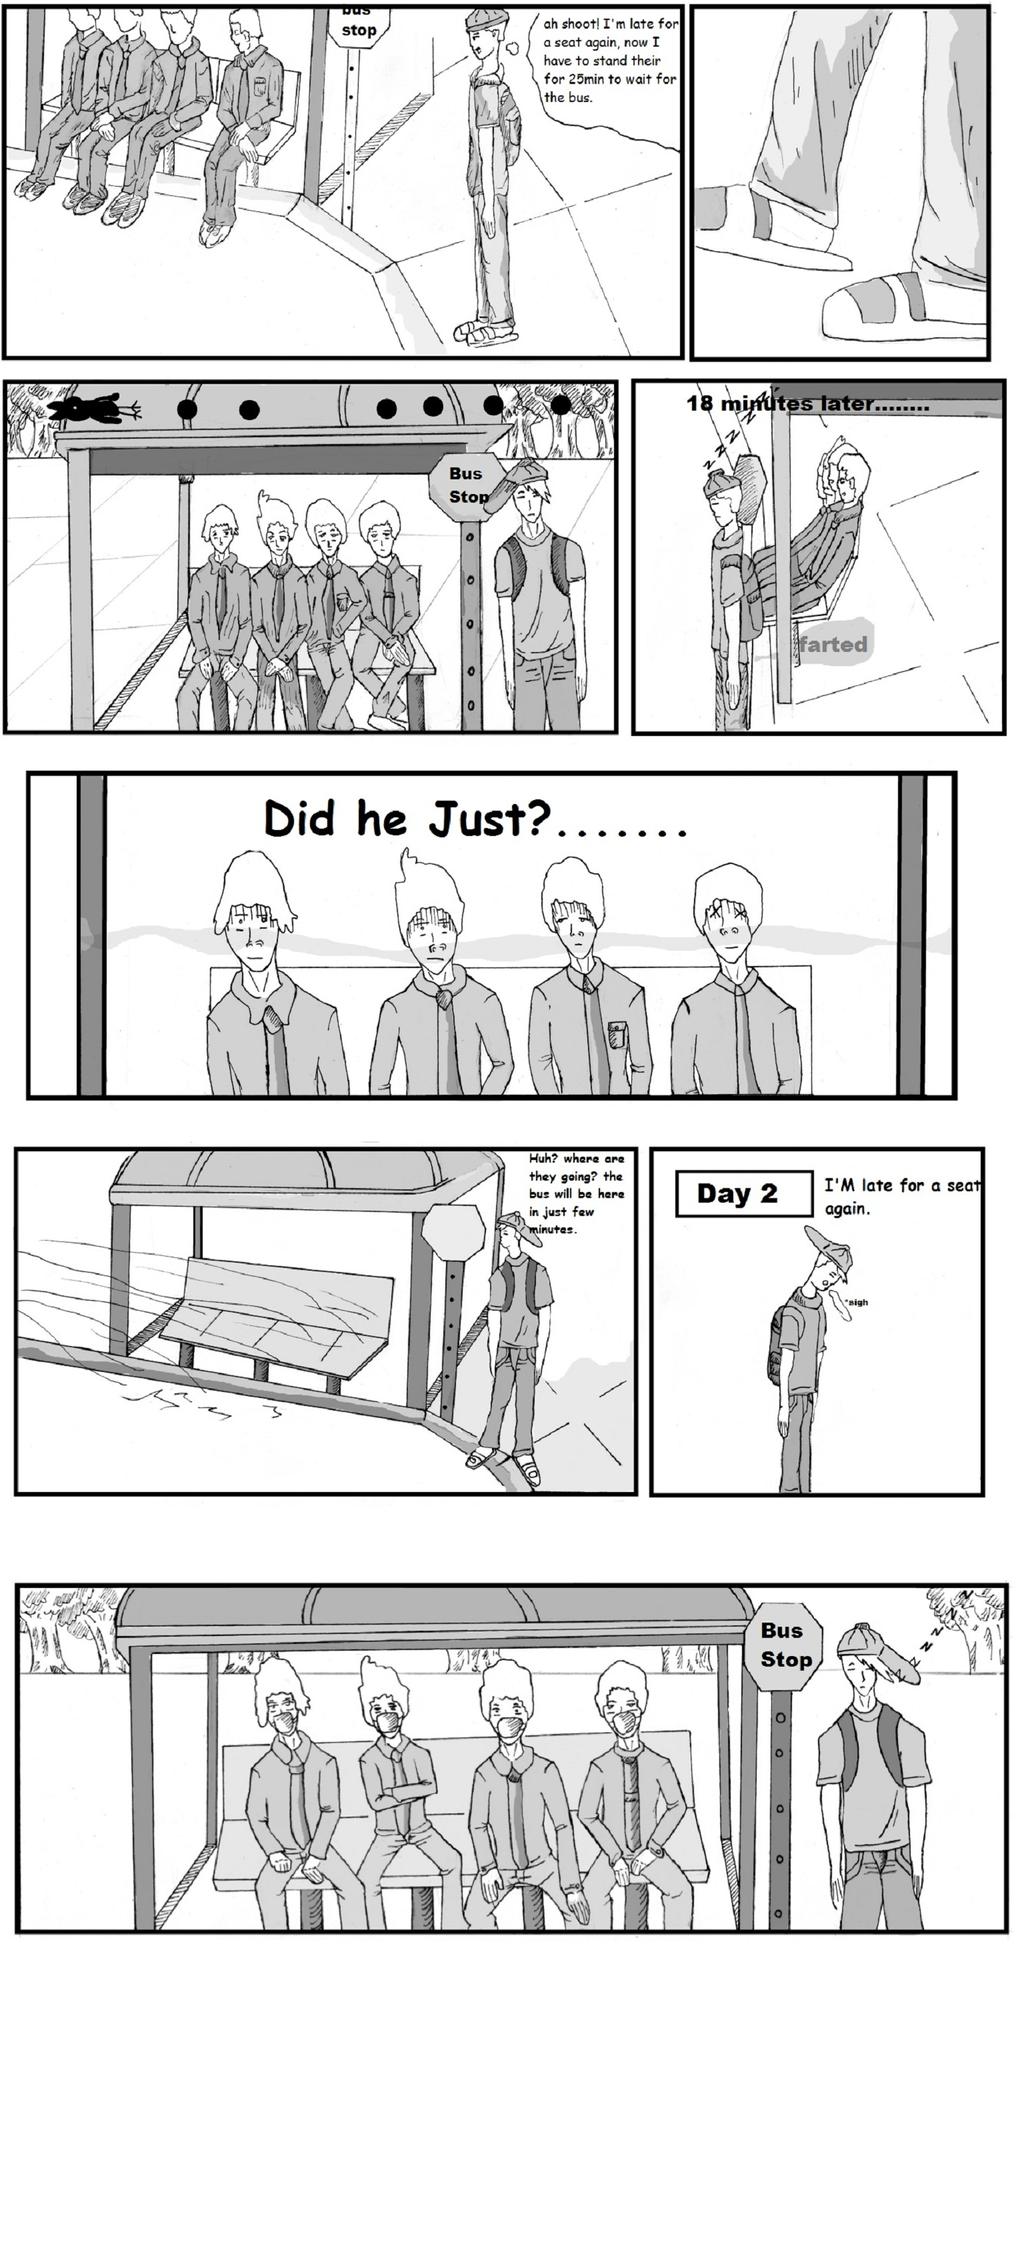 I farted...(comic strip.) by kongqian7